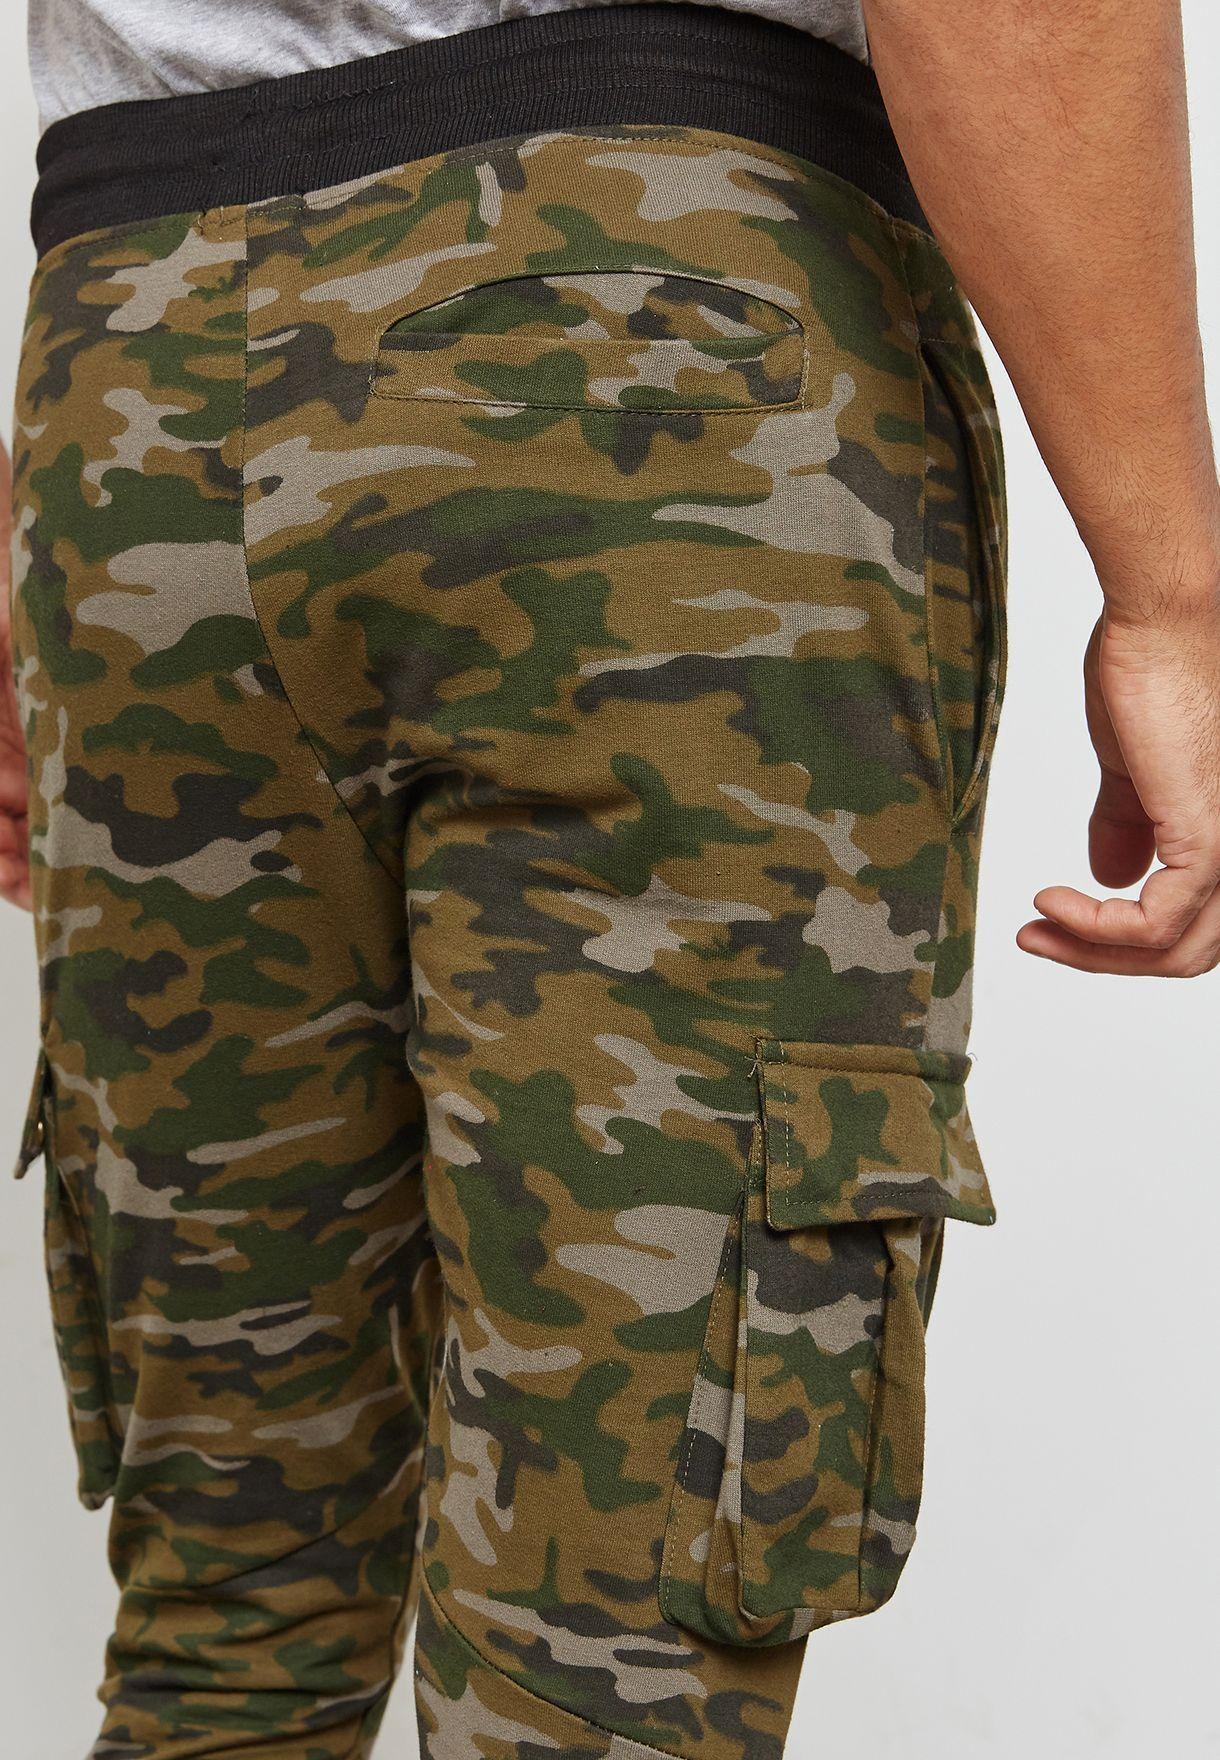 Pocket Detail Camo Sweatpants